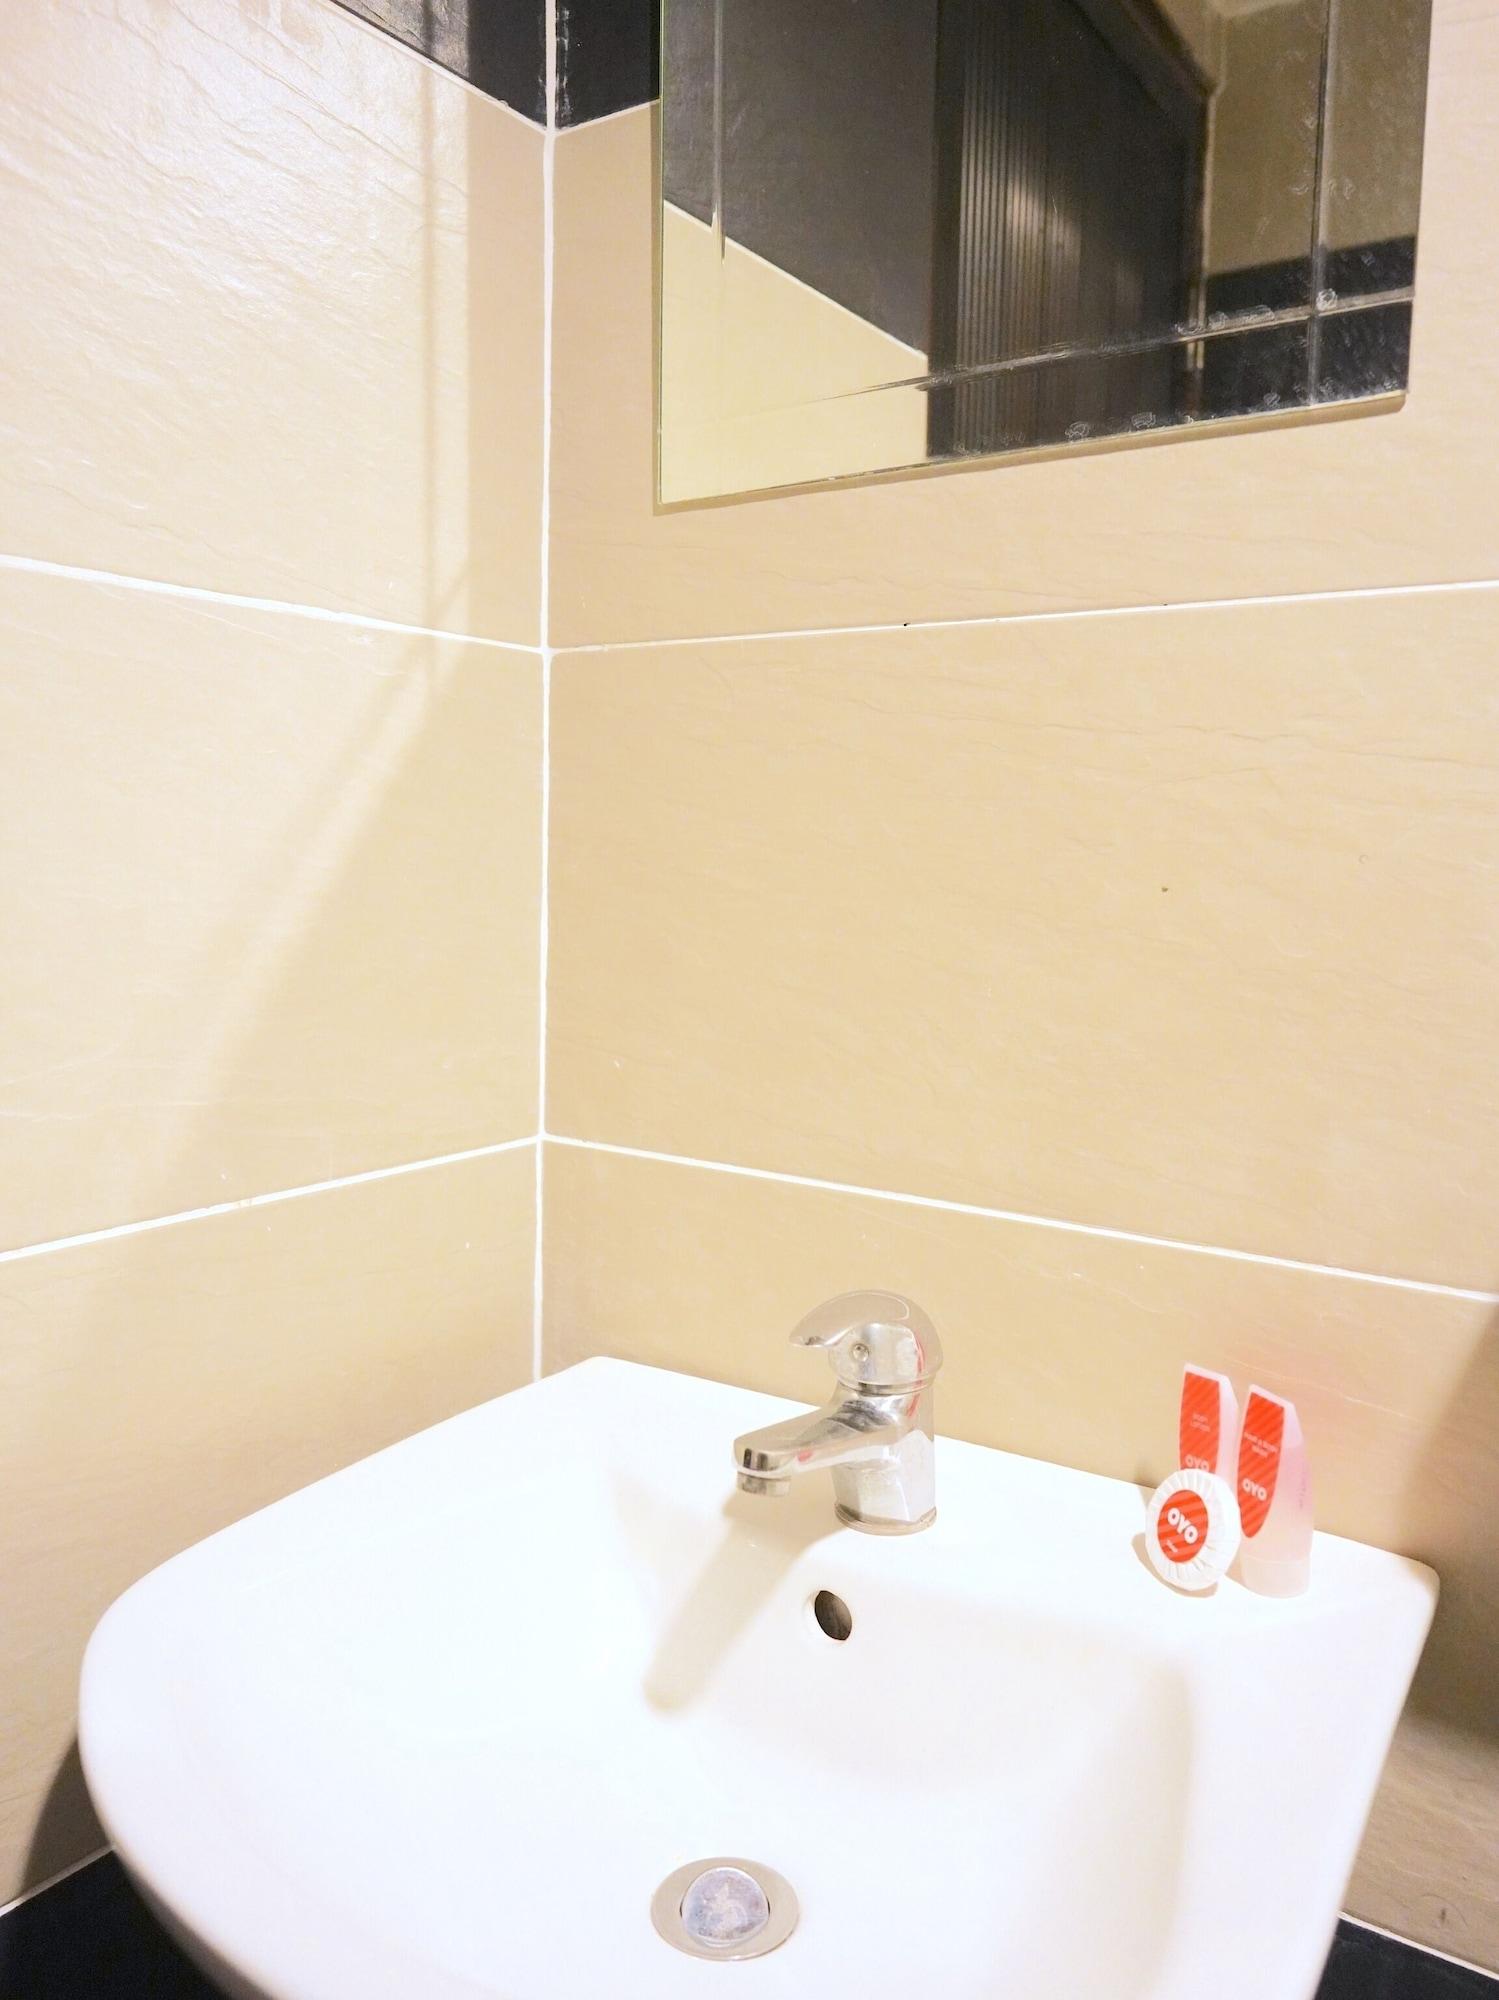 SPOT ON 89992 Hotel Azra, Machang